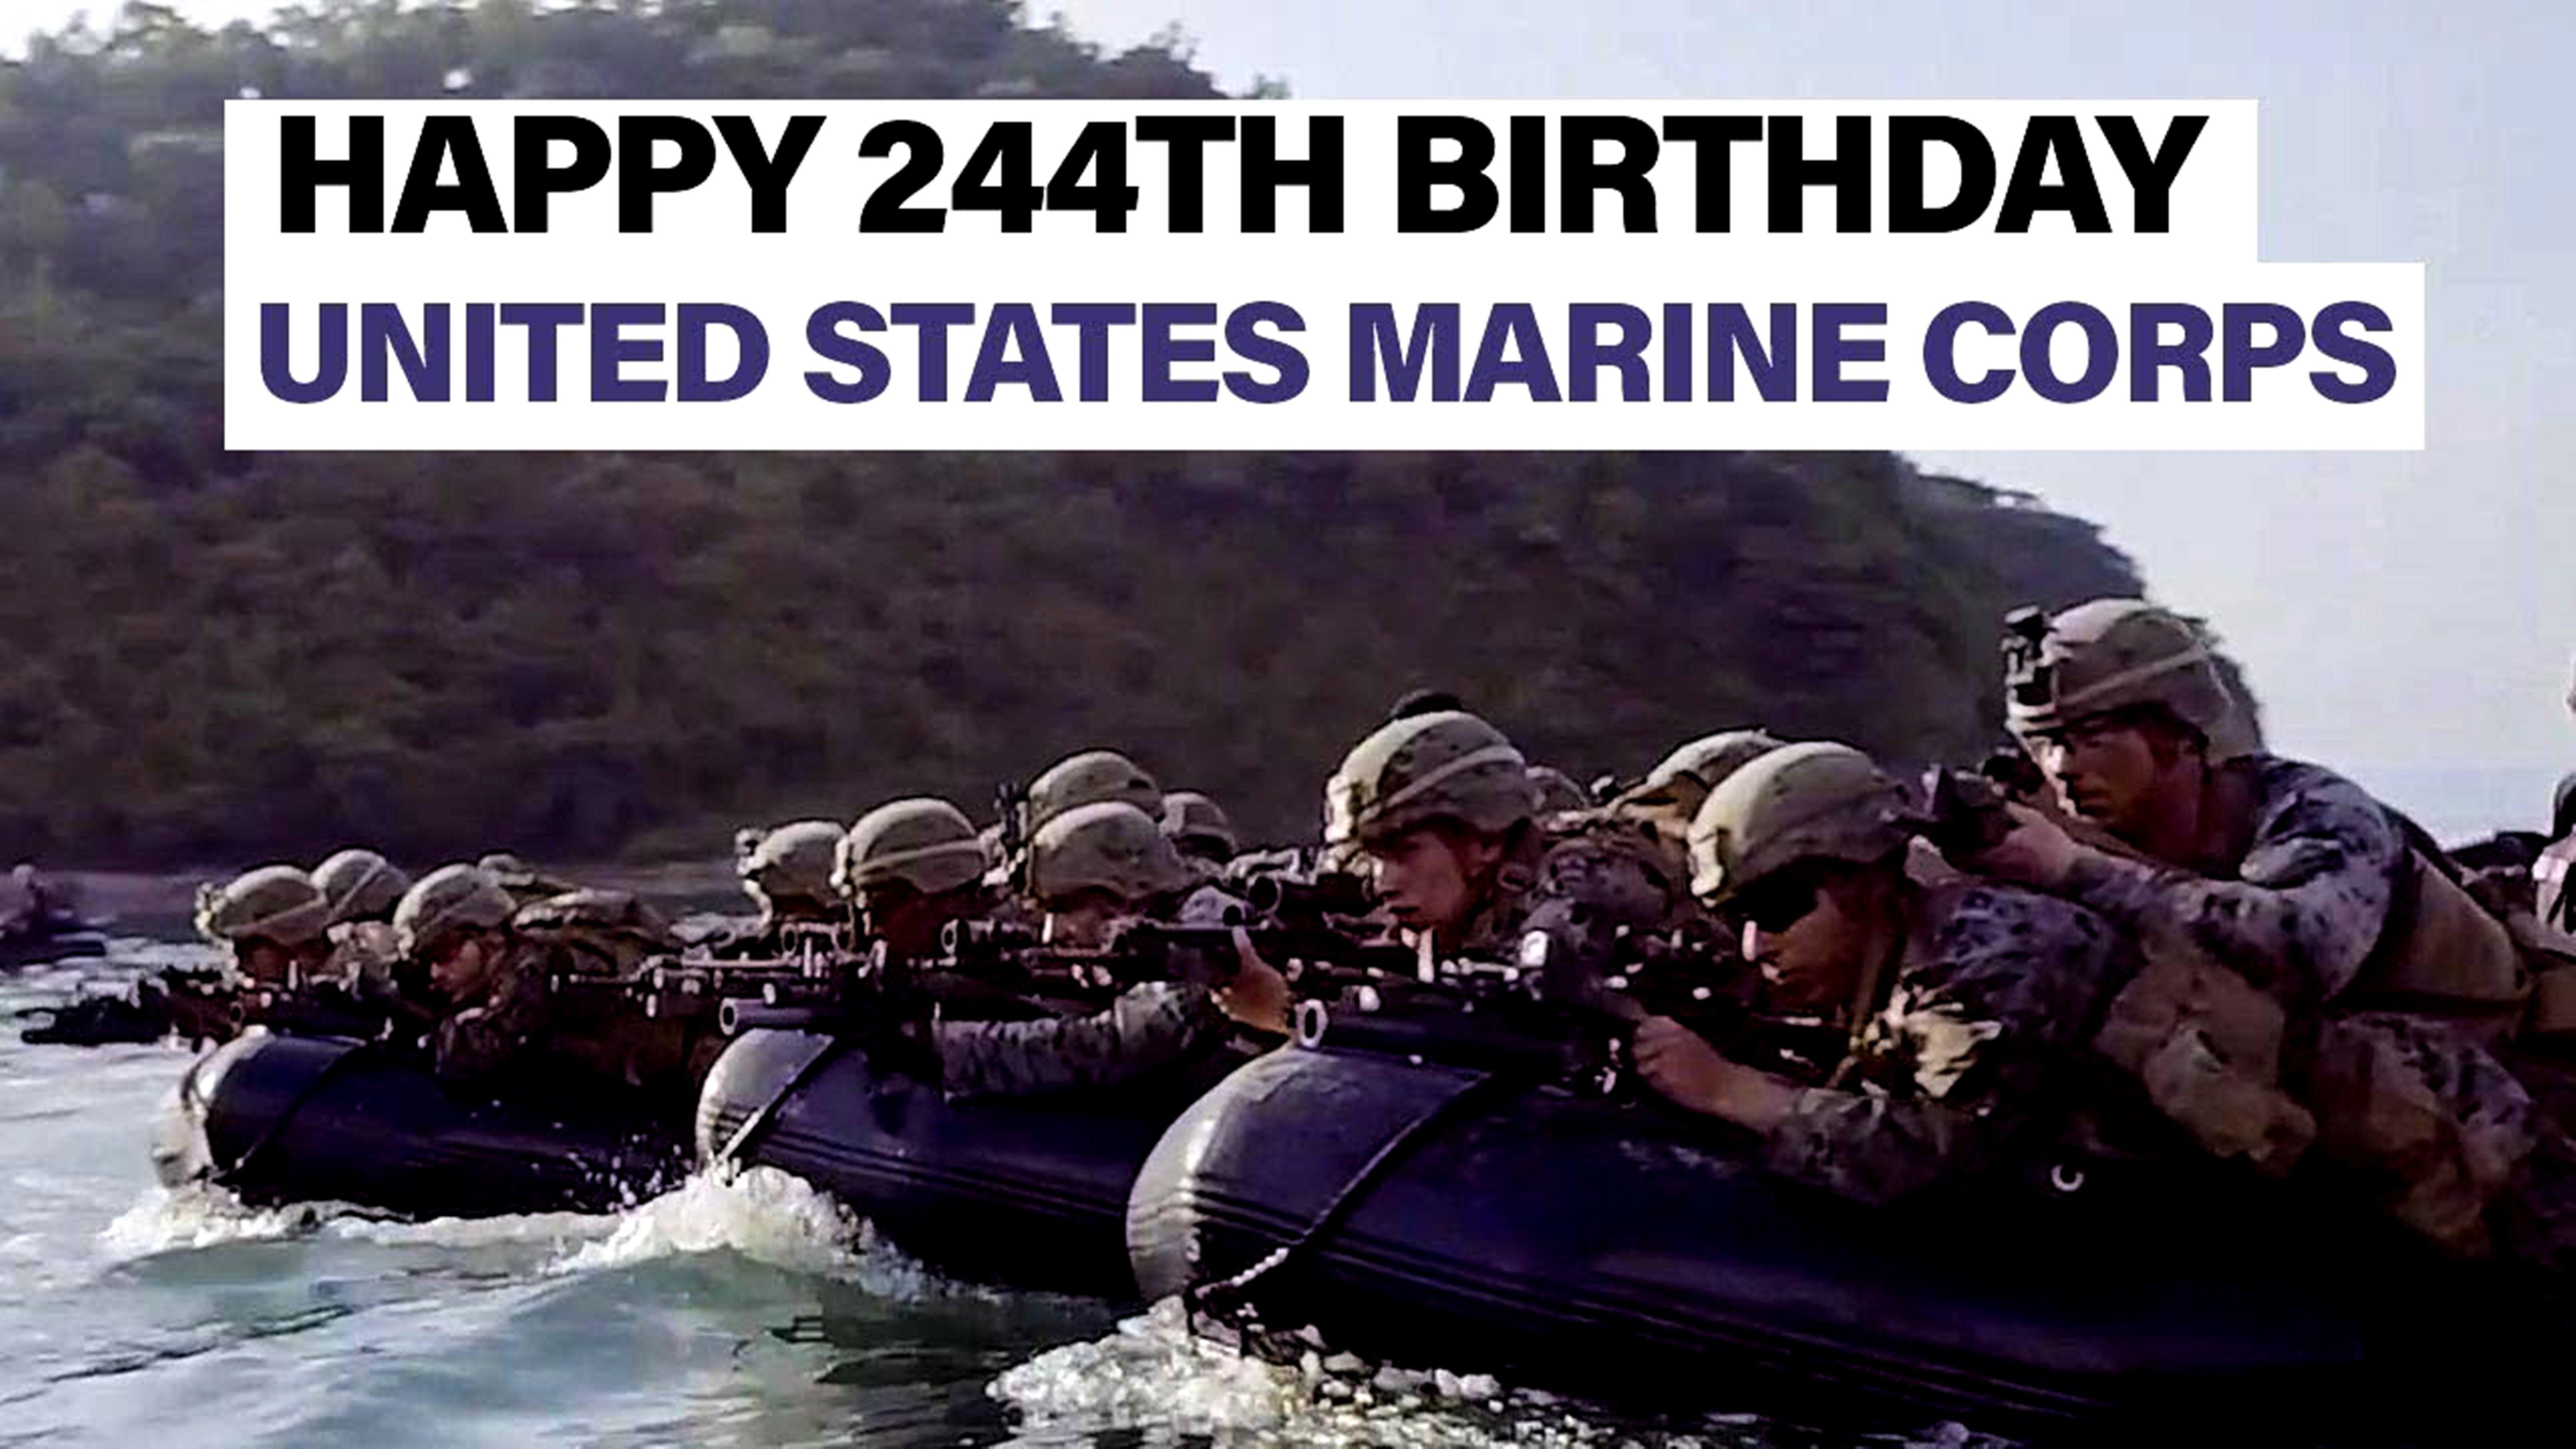 United States Marine Corps Celebrates 244th Birthday